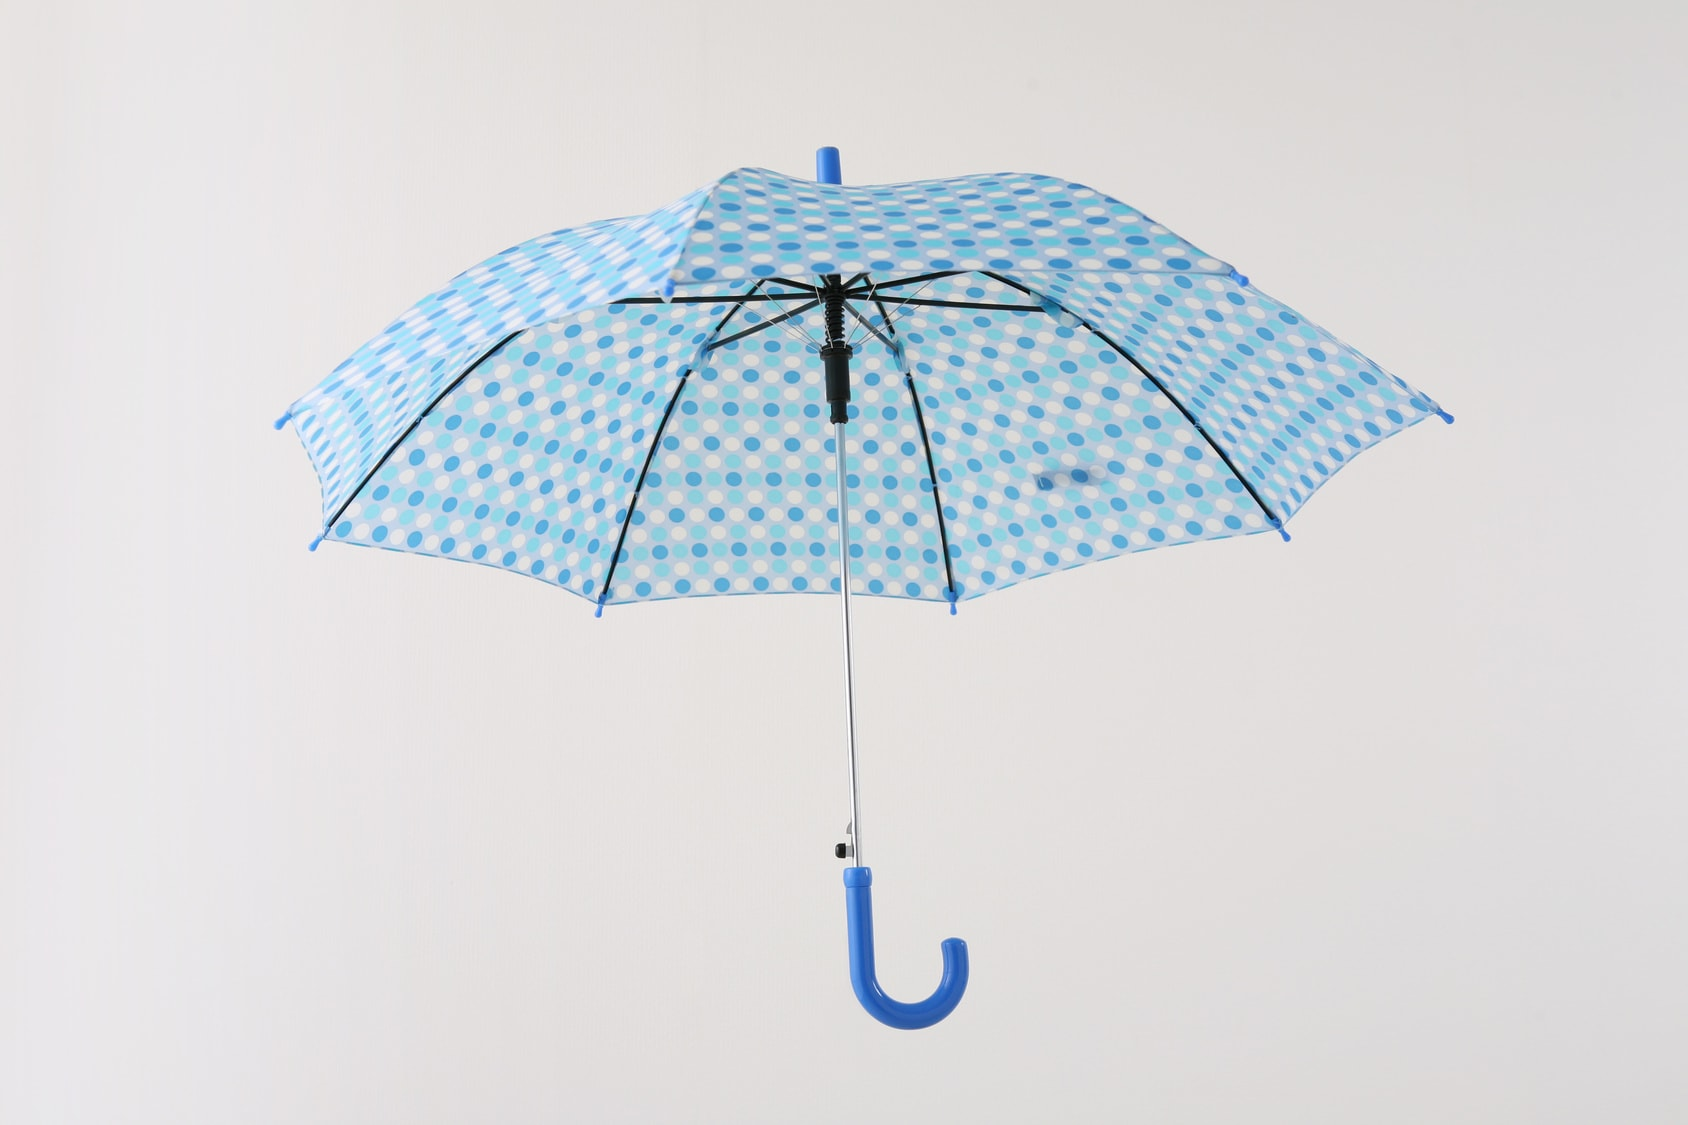 Fun (Seriously) Umbrella History & Triviaimage preview